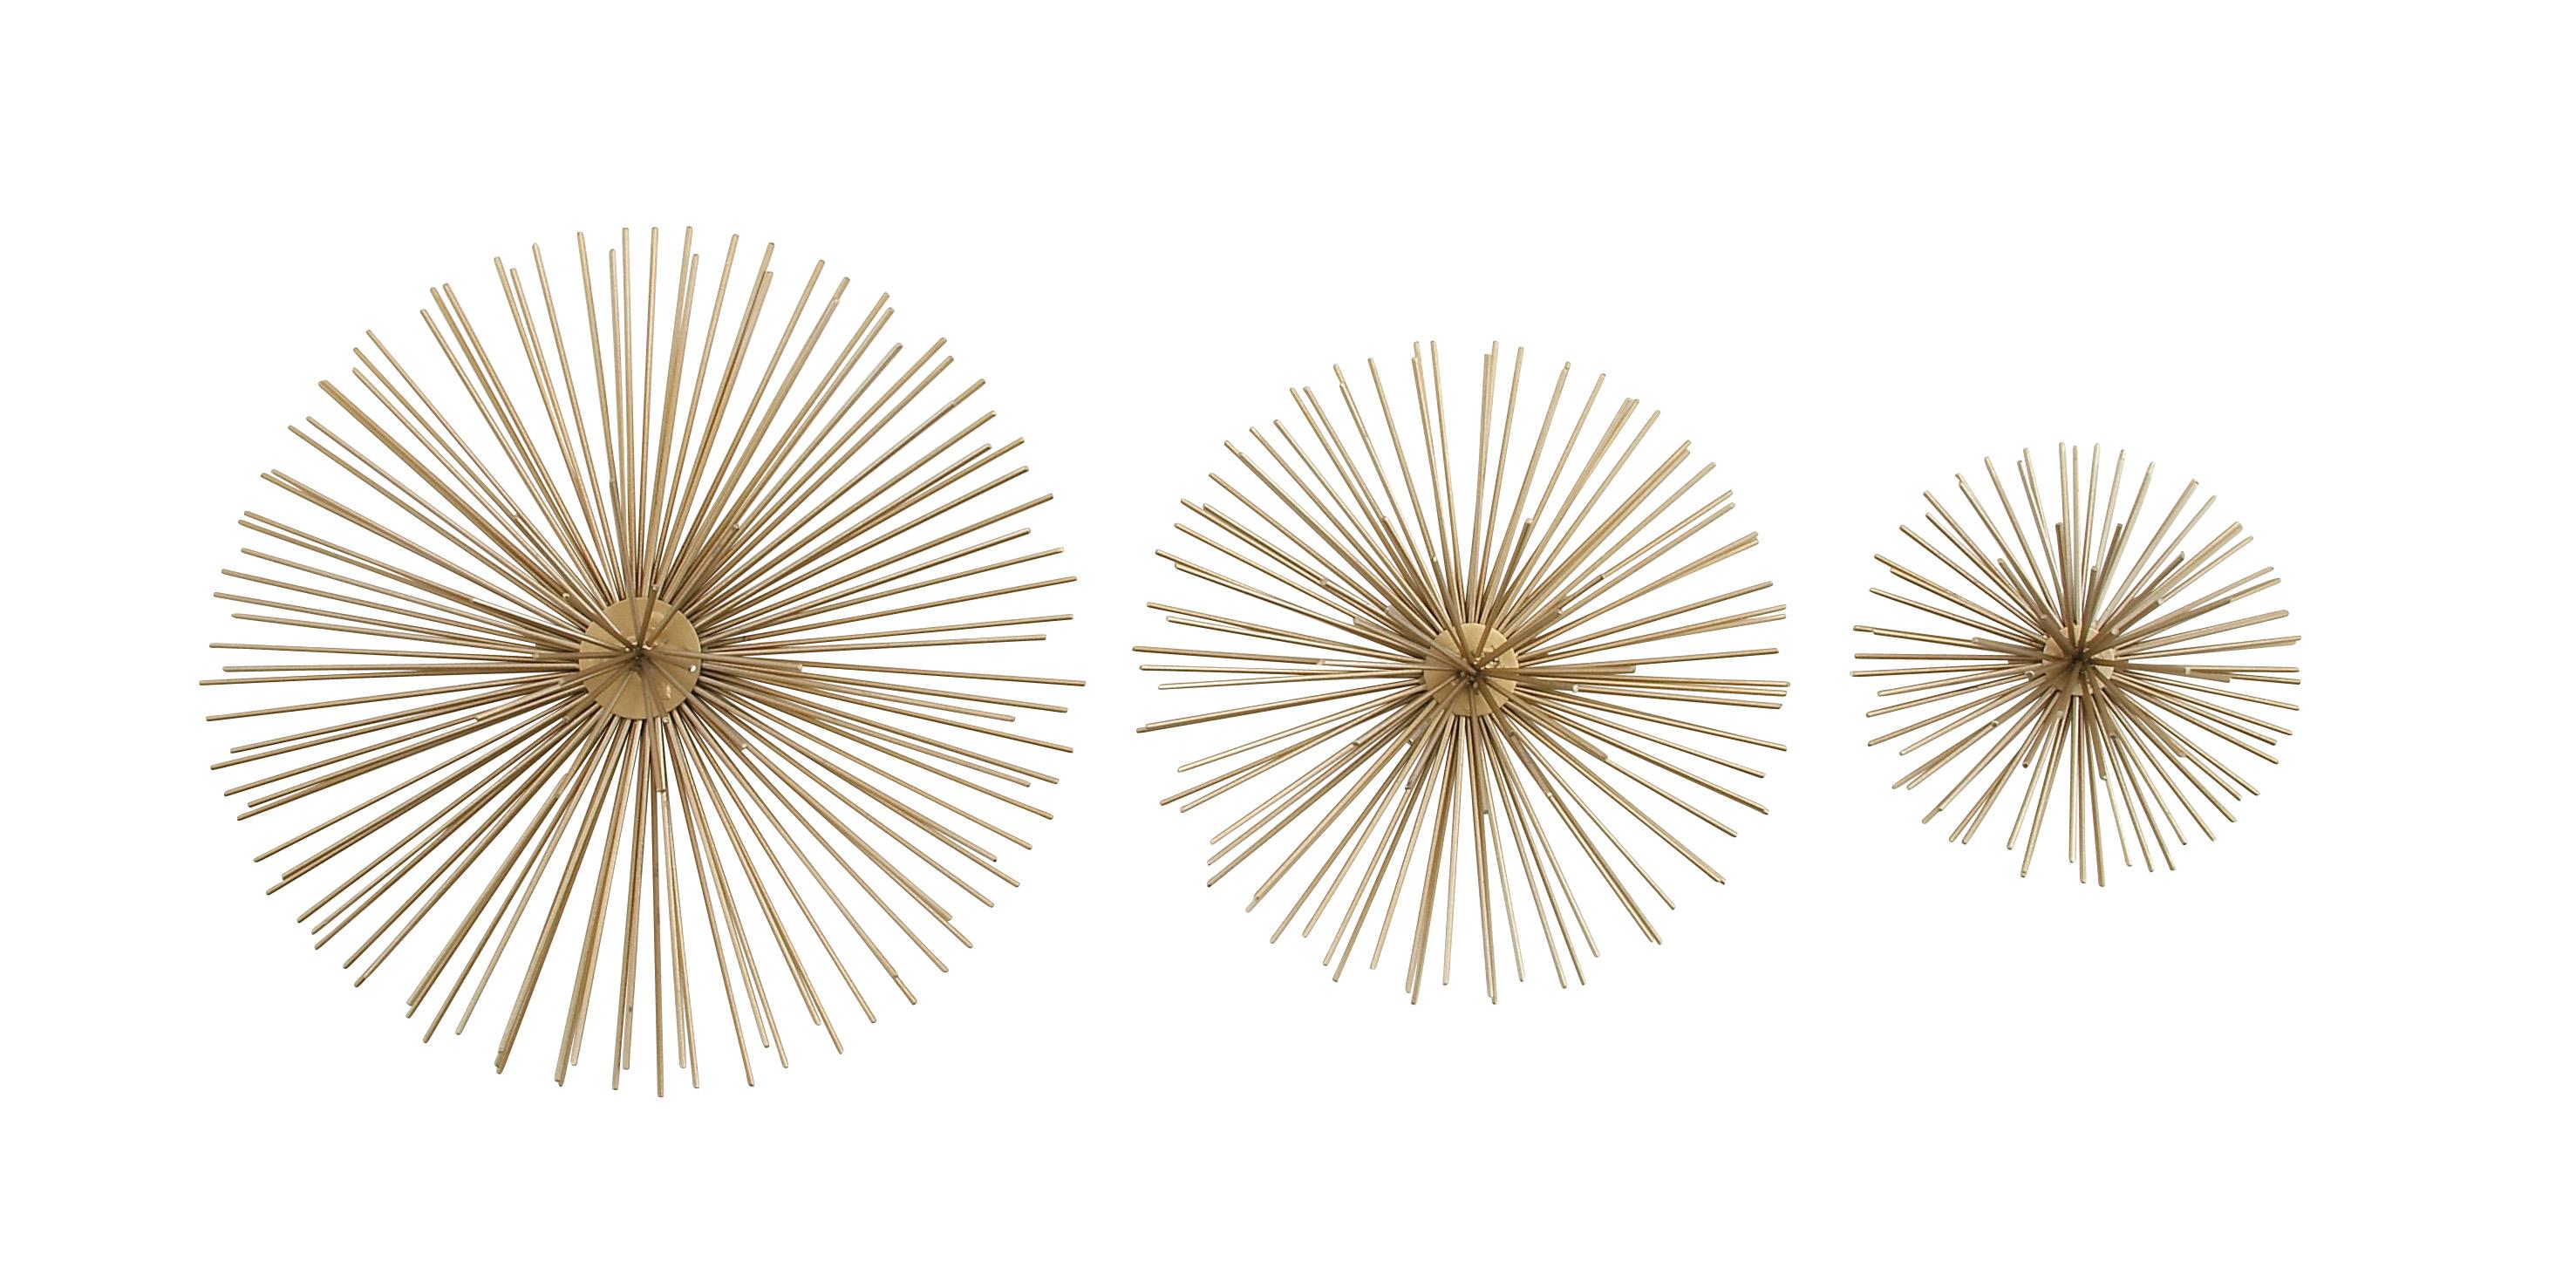 Decmode Metallic Gold Starburst Modern Metal Wall Décor | Set Of 3 regarding Set of 3 Contemporary 6, 9, and 11 Inch Gold Tin Starburst Sculptures (Image 11 of 30)